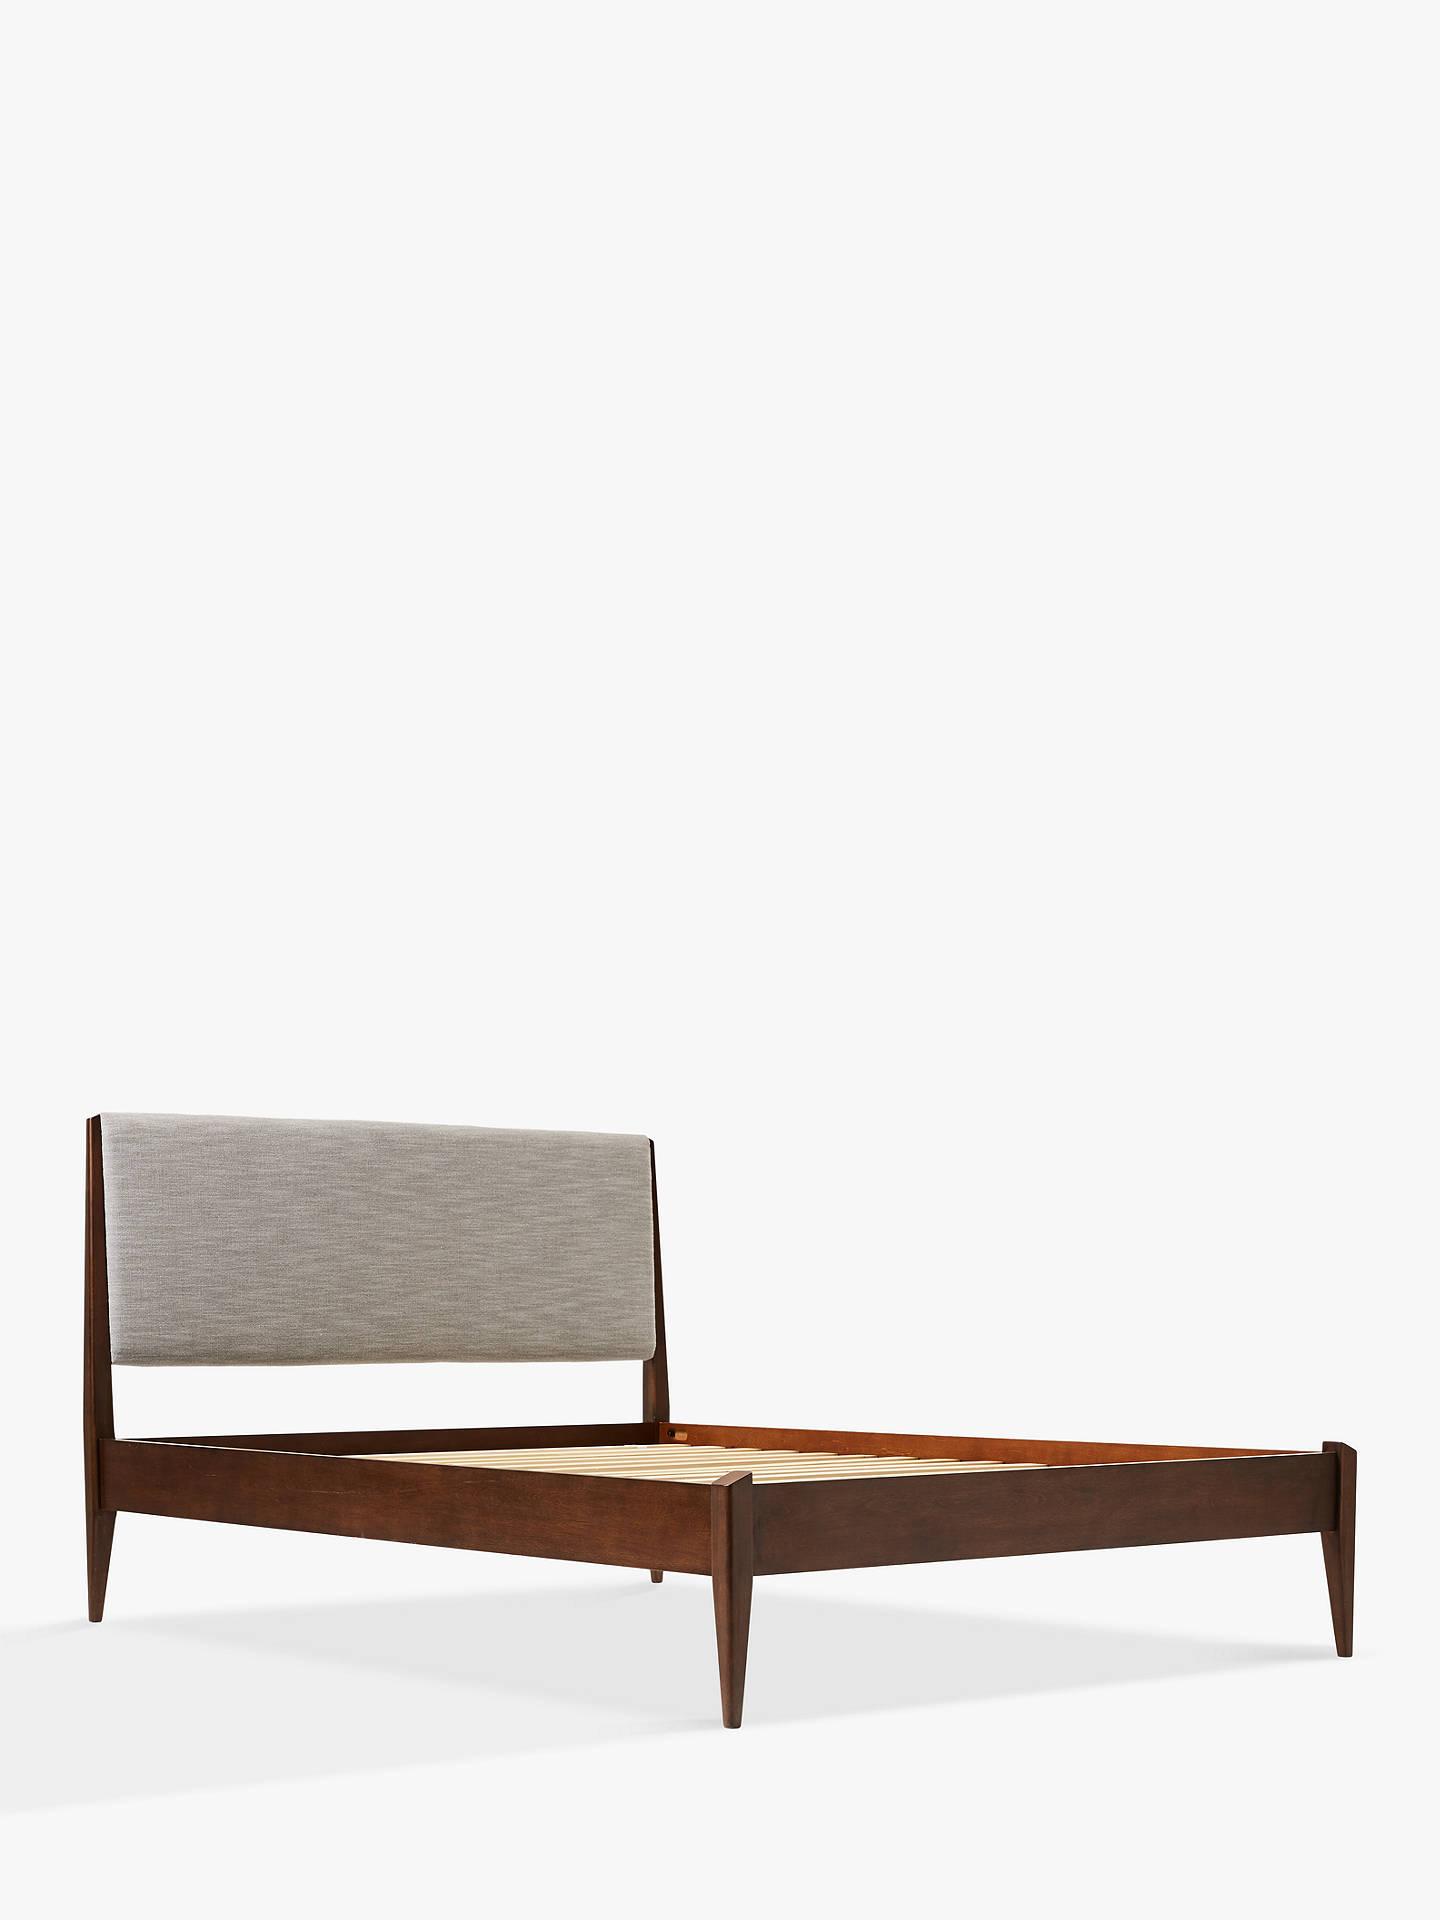 John Lewis & west elm Modern Show Bed King Size Brown